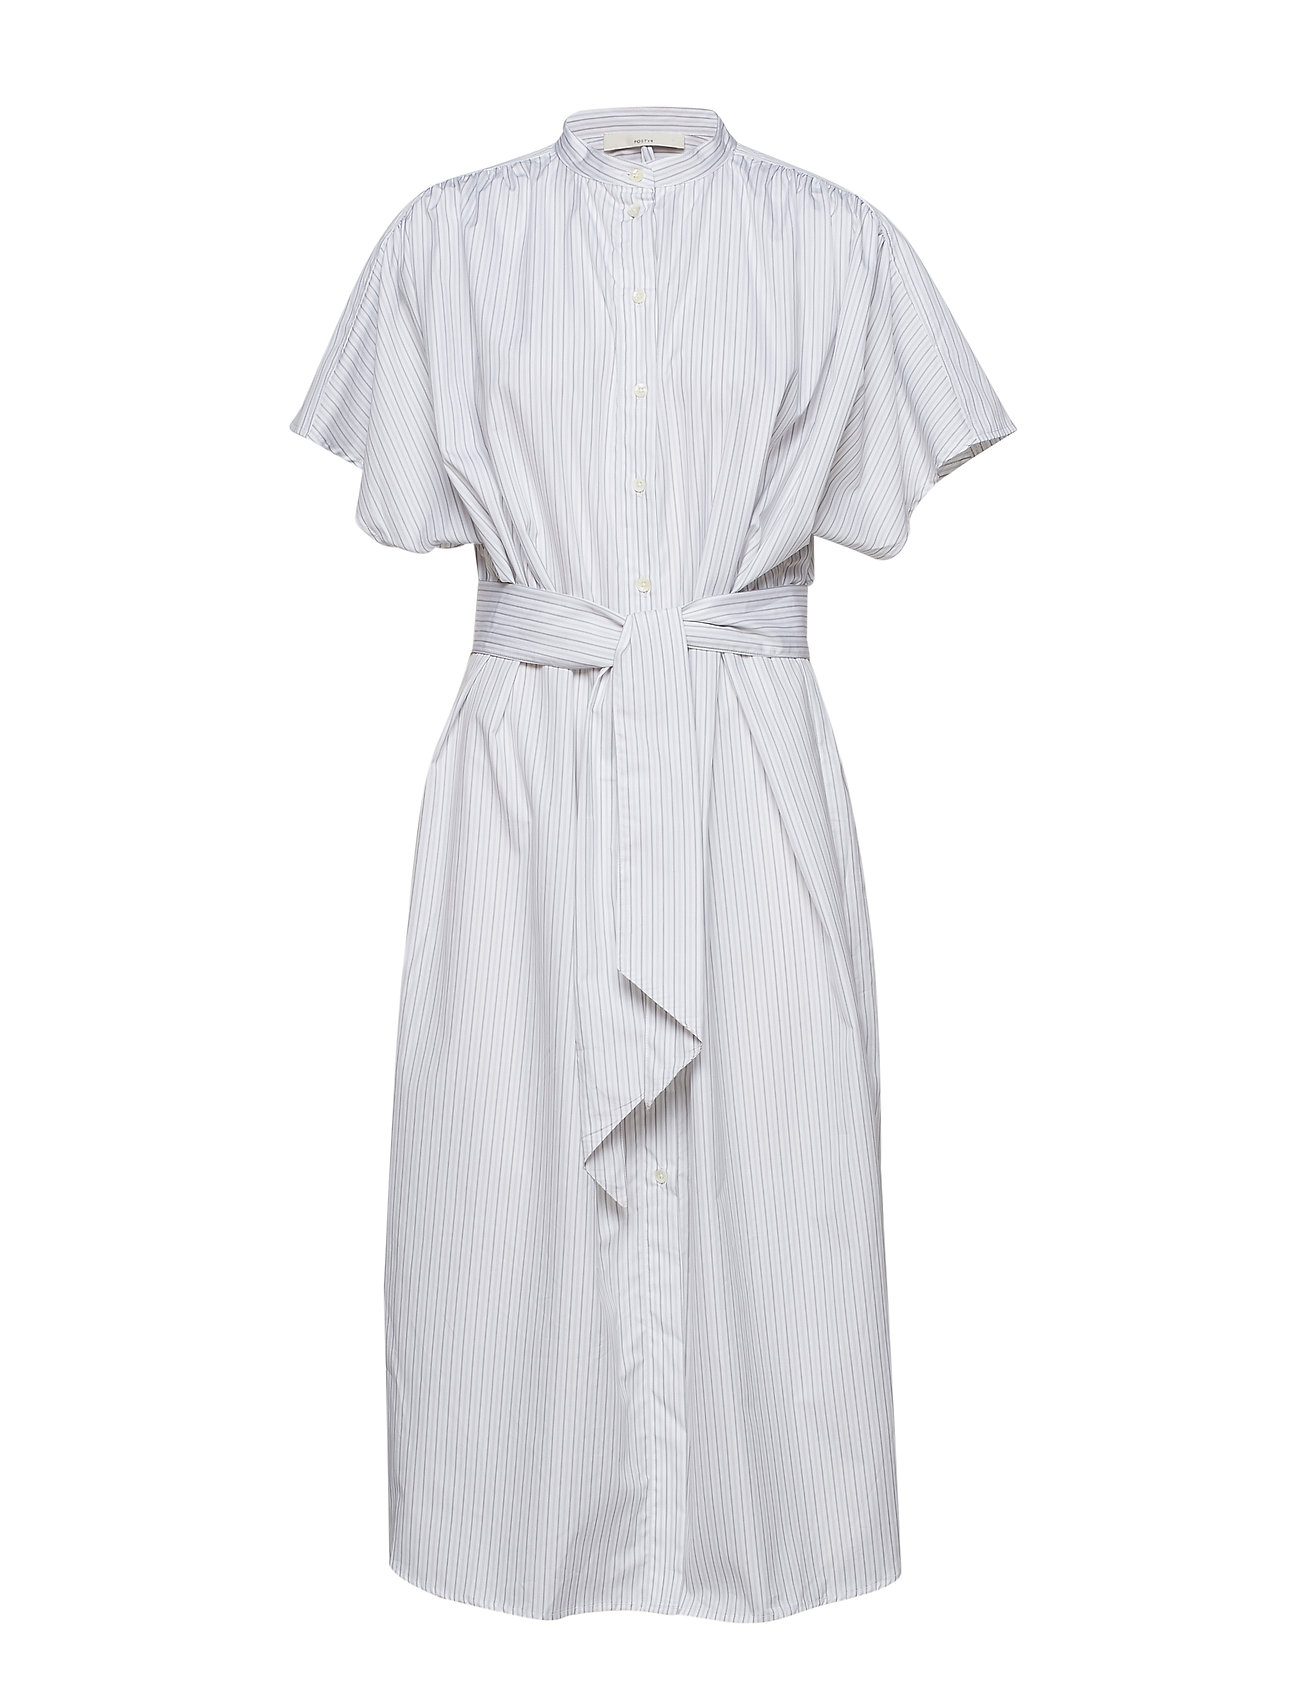 POSTYR POSDISA SHIRT DRESS - BRIGHT WHITE